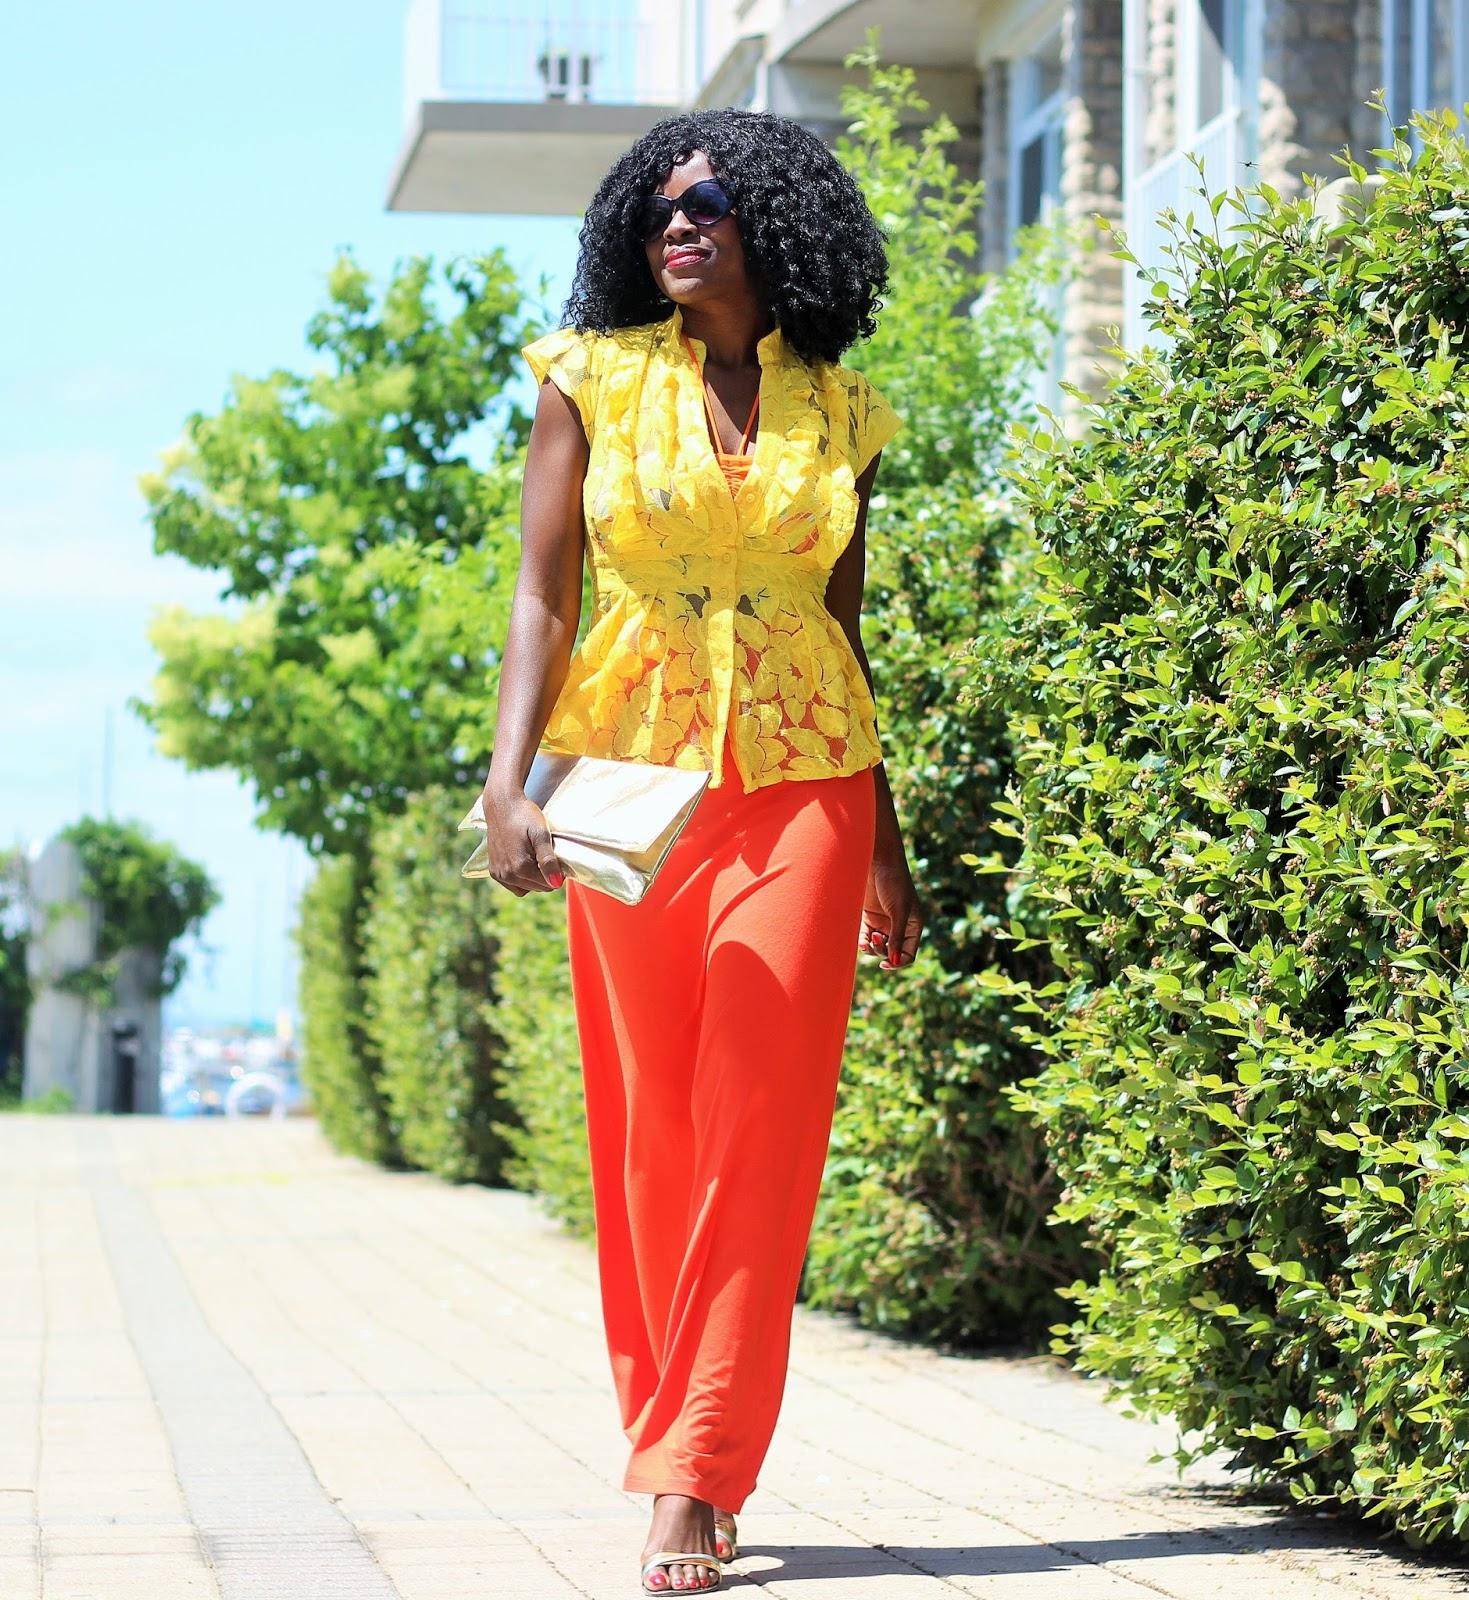 SUMMER LAYERING Bikini Style with Lace Top x Maxi Skirt